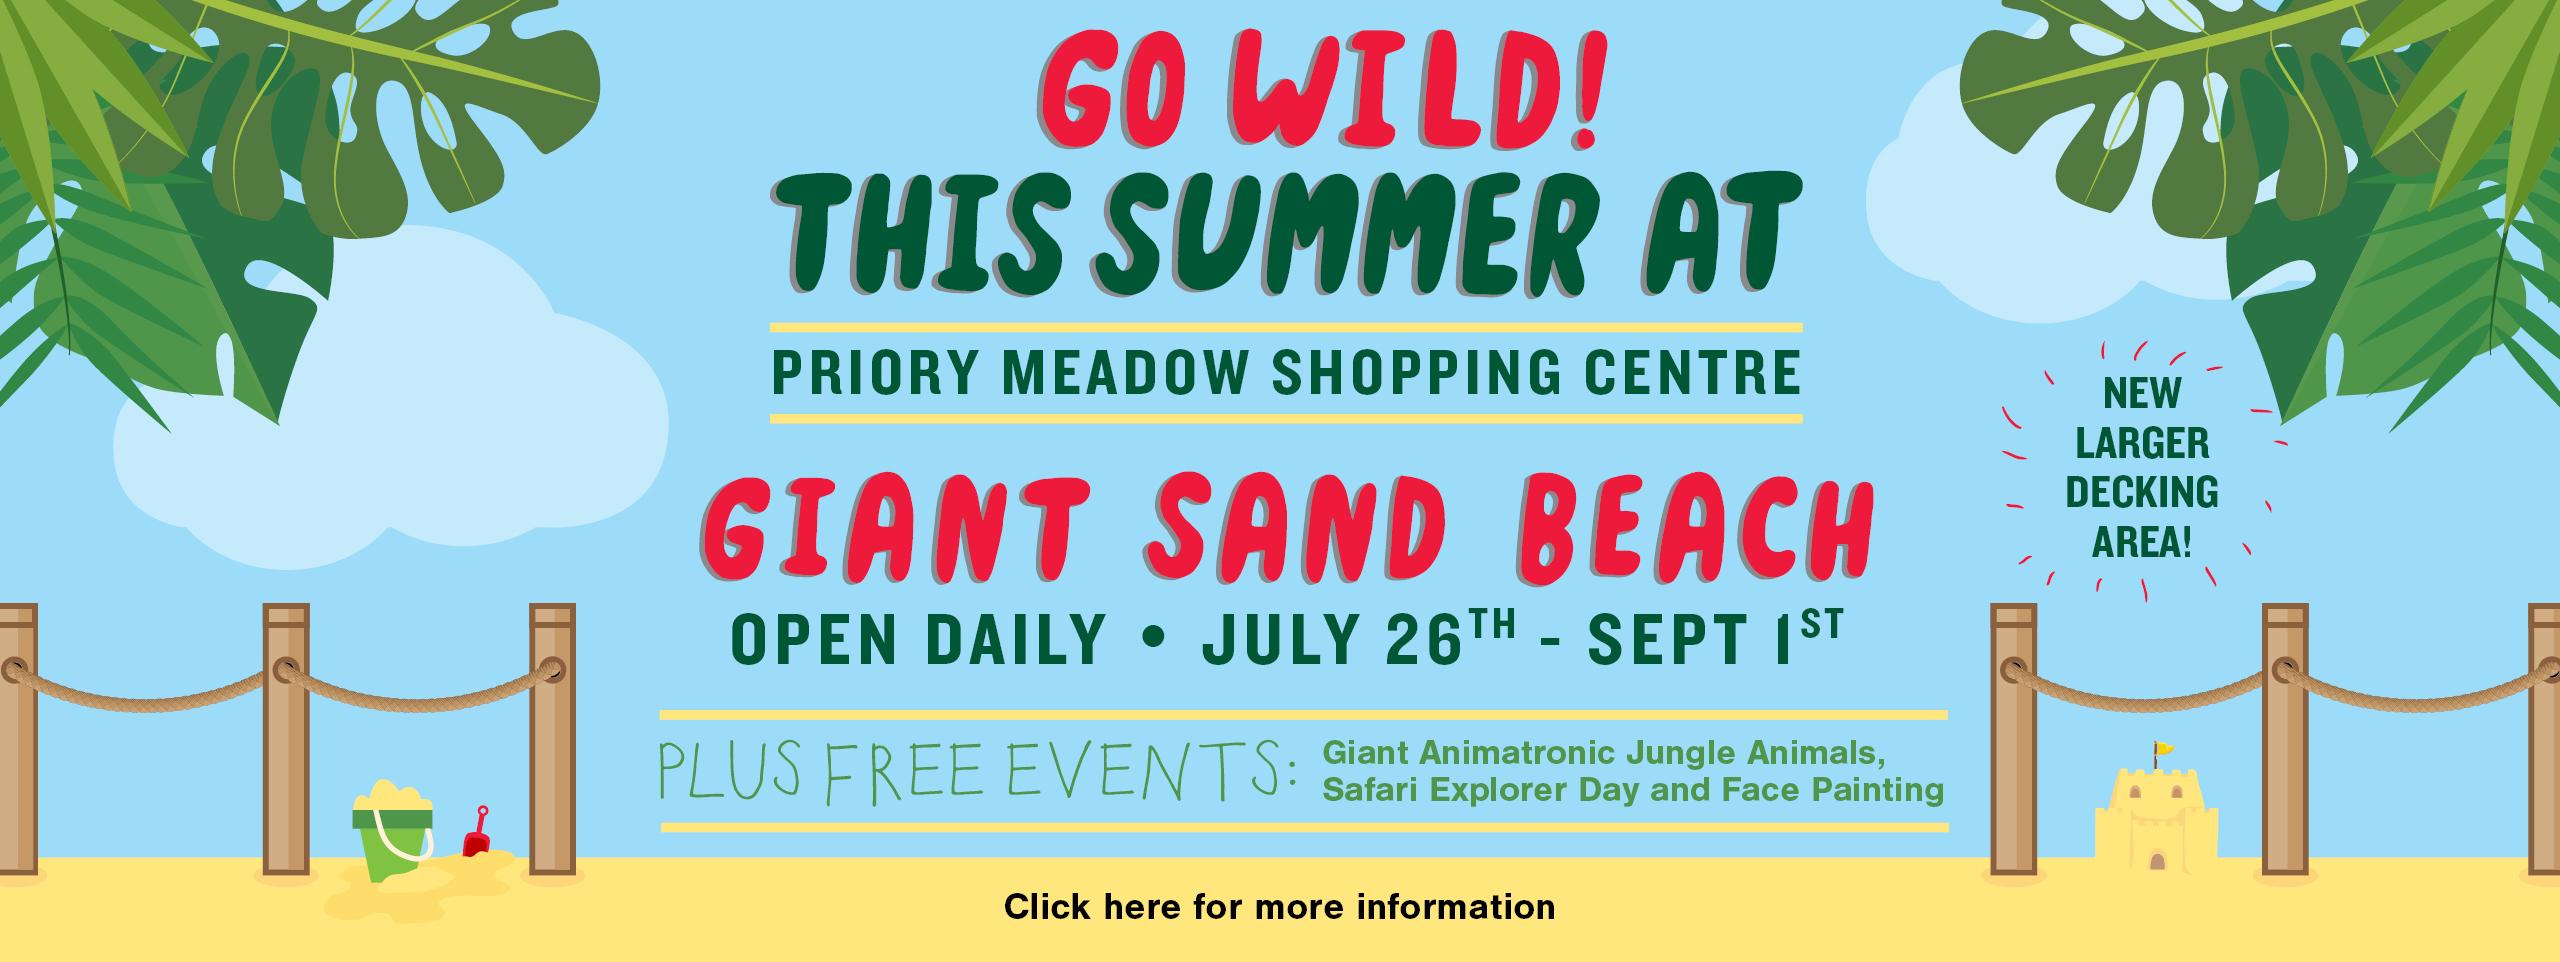 Priory Meadows Summer Go Wild Web Banner JUN19 V1